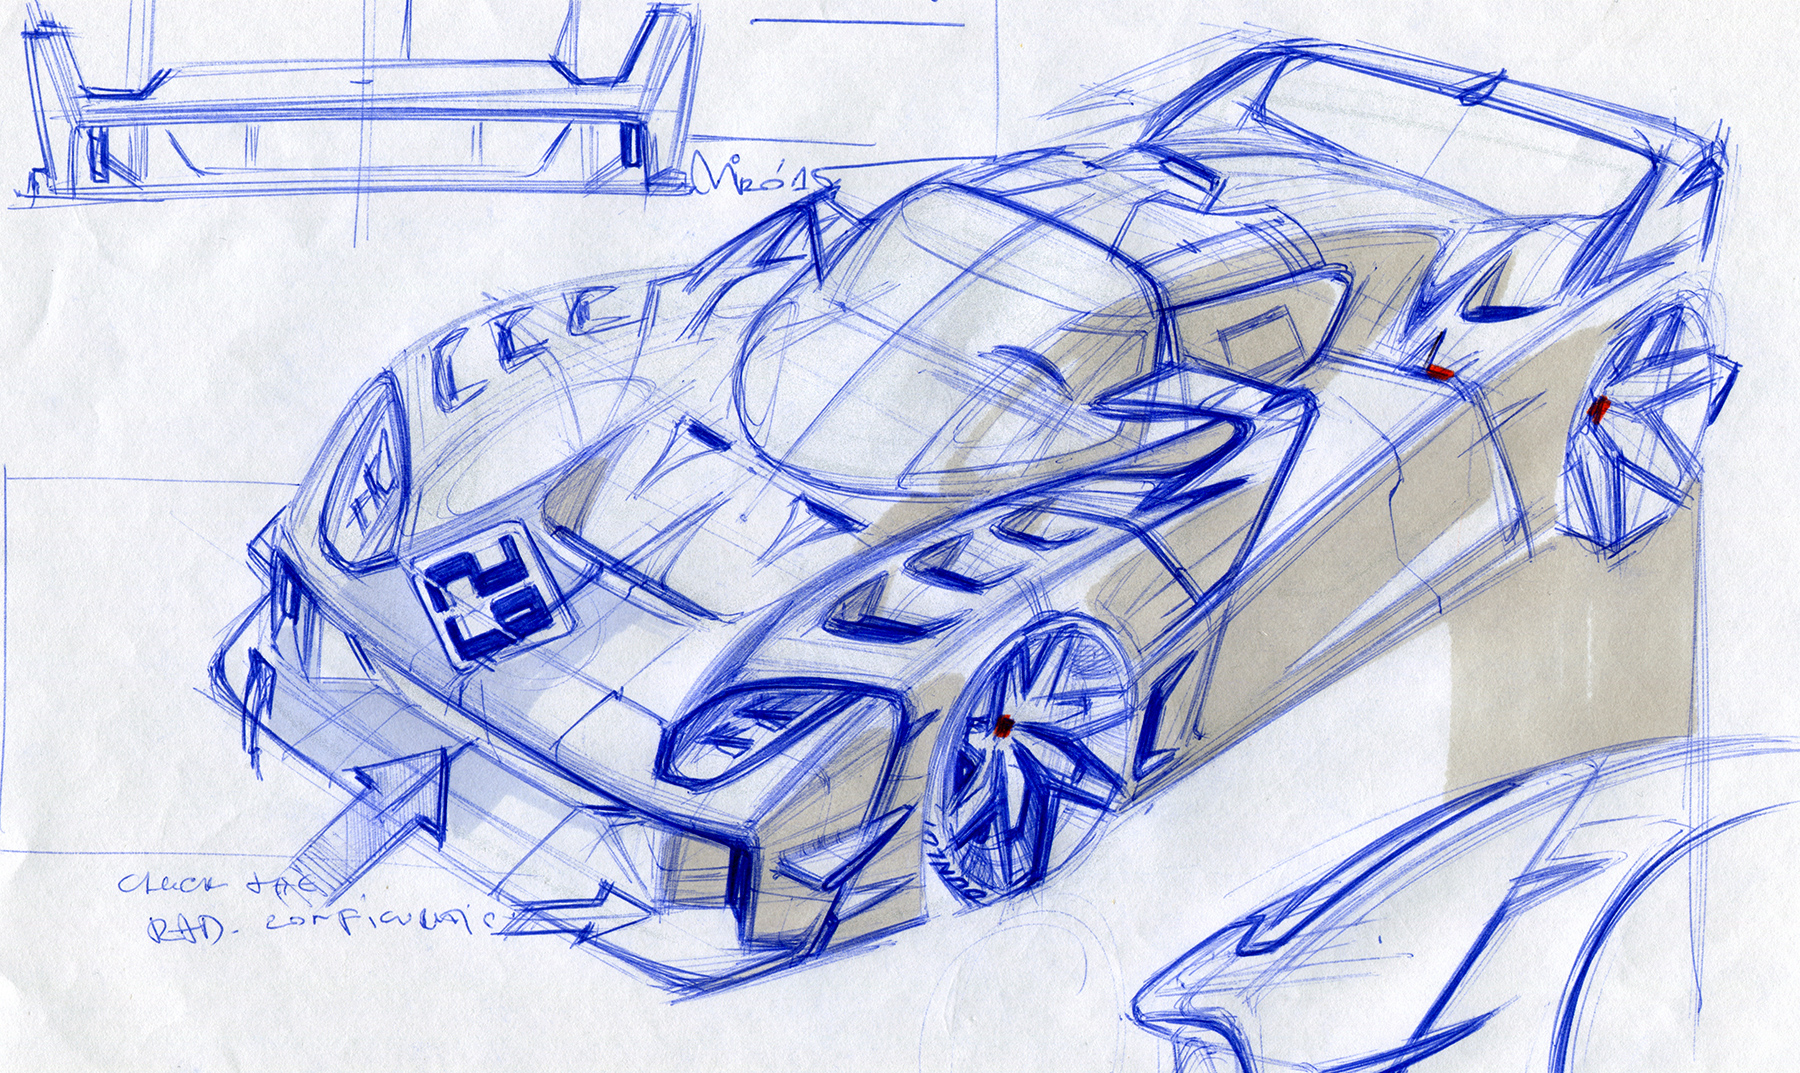 EIDO GTR Concept Sketch by Miroslav Dimitrov | Copyright © 2017 Miroslav Dimitrov